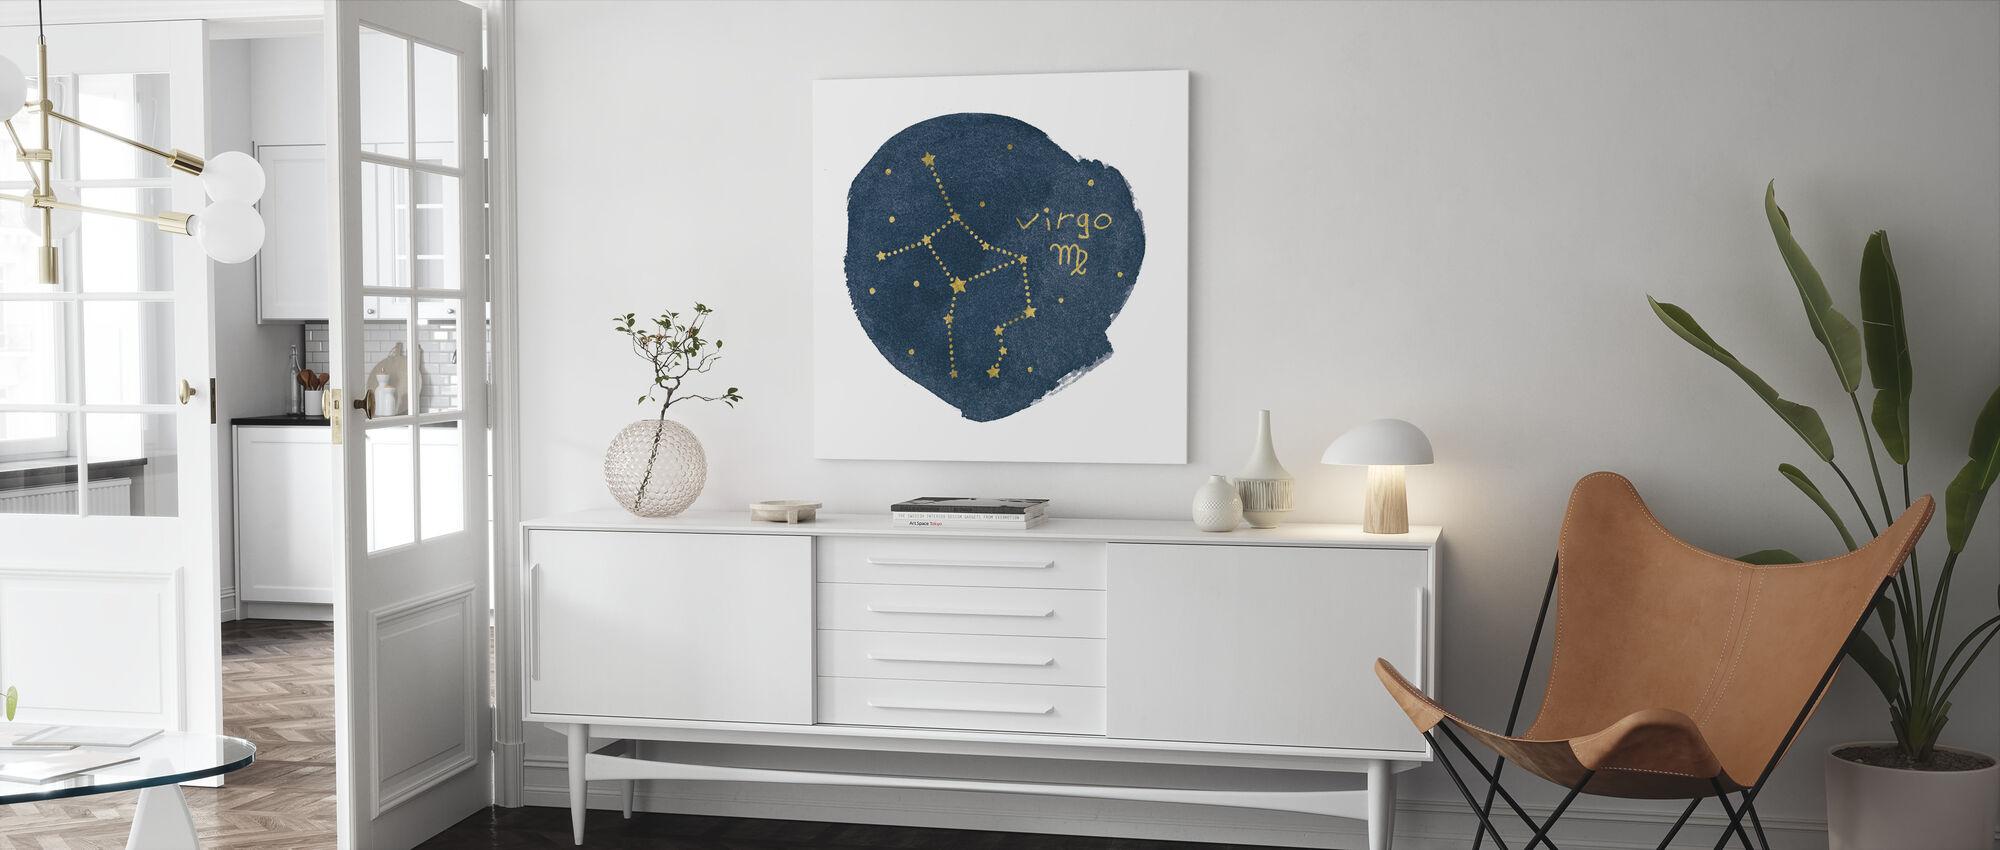 Horoscope Virgo - Canvas print - Living Room